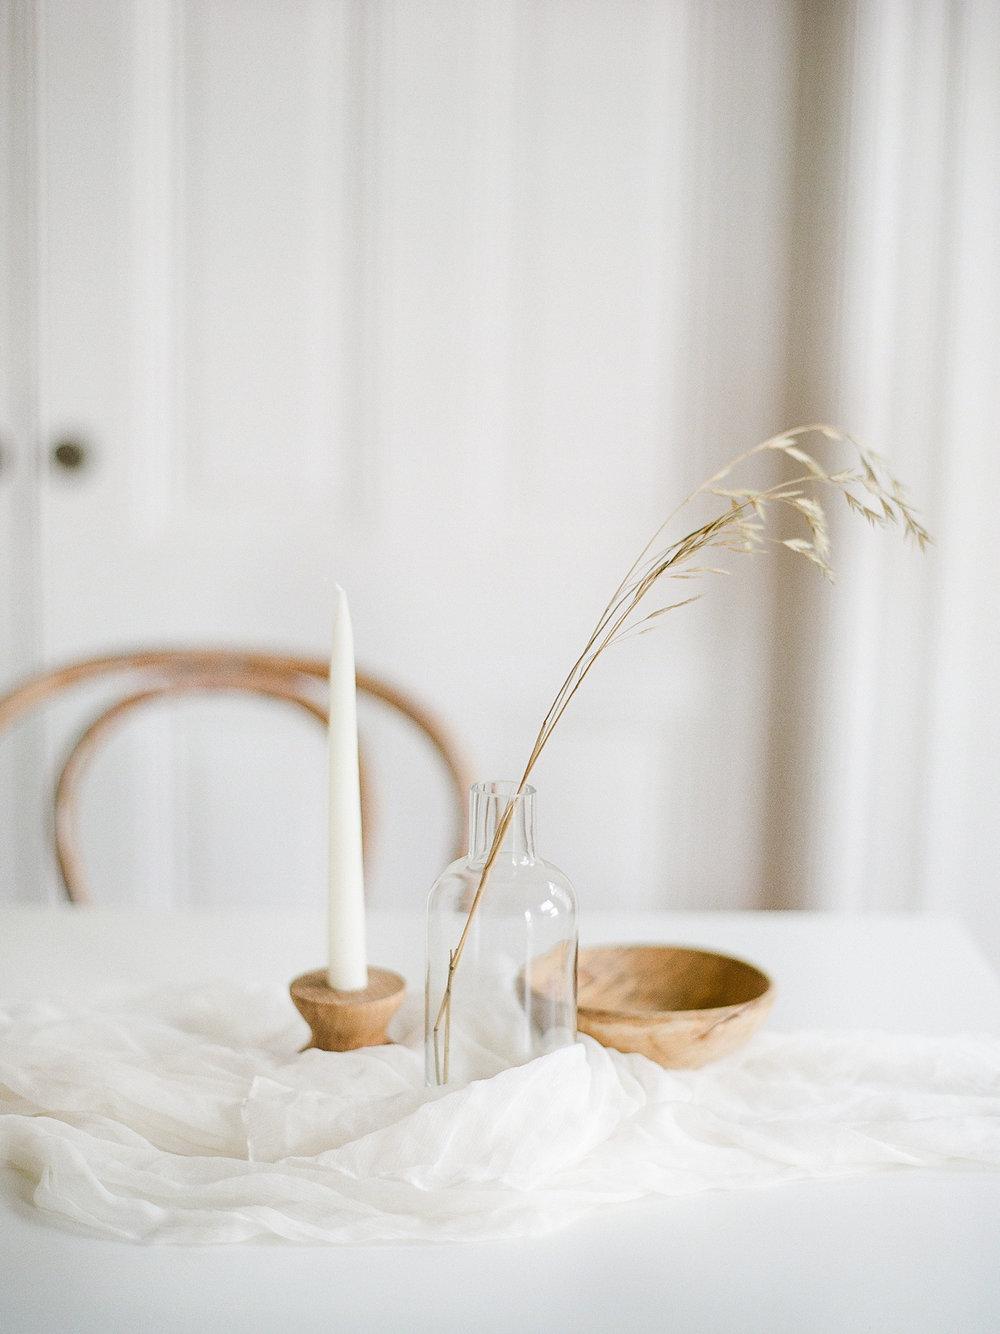 MInimalist wedding ideas